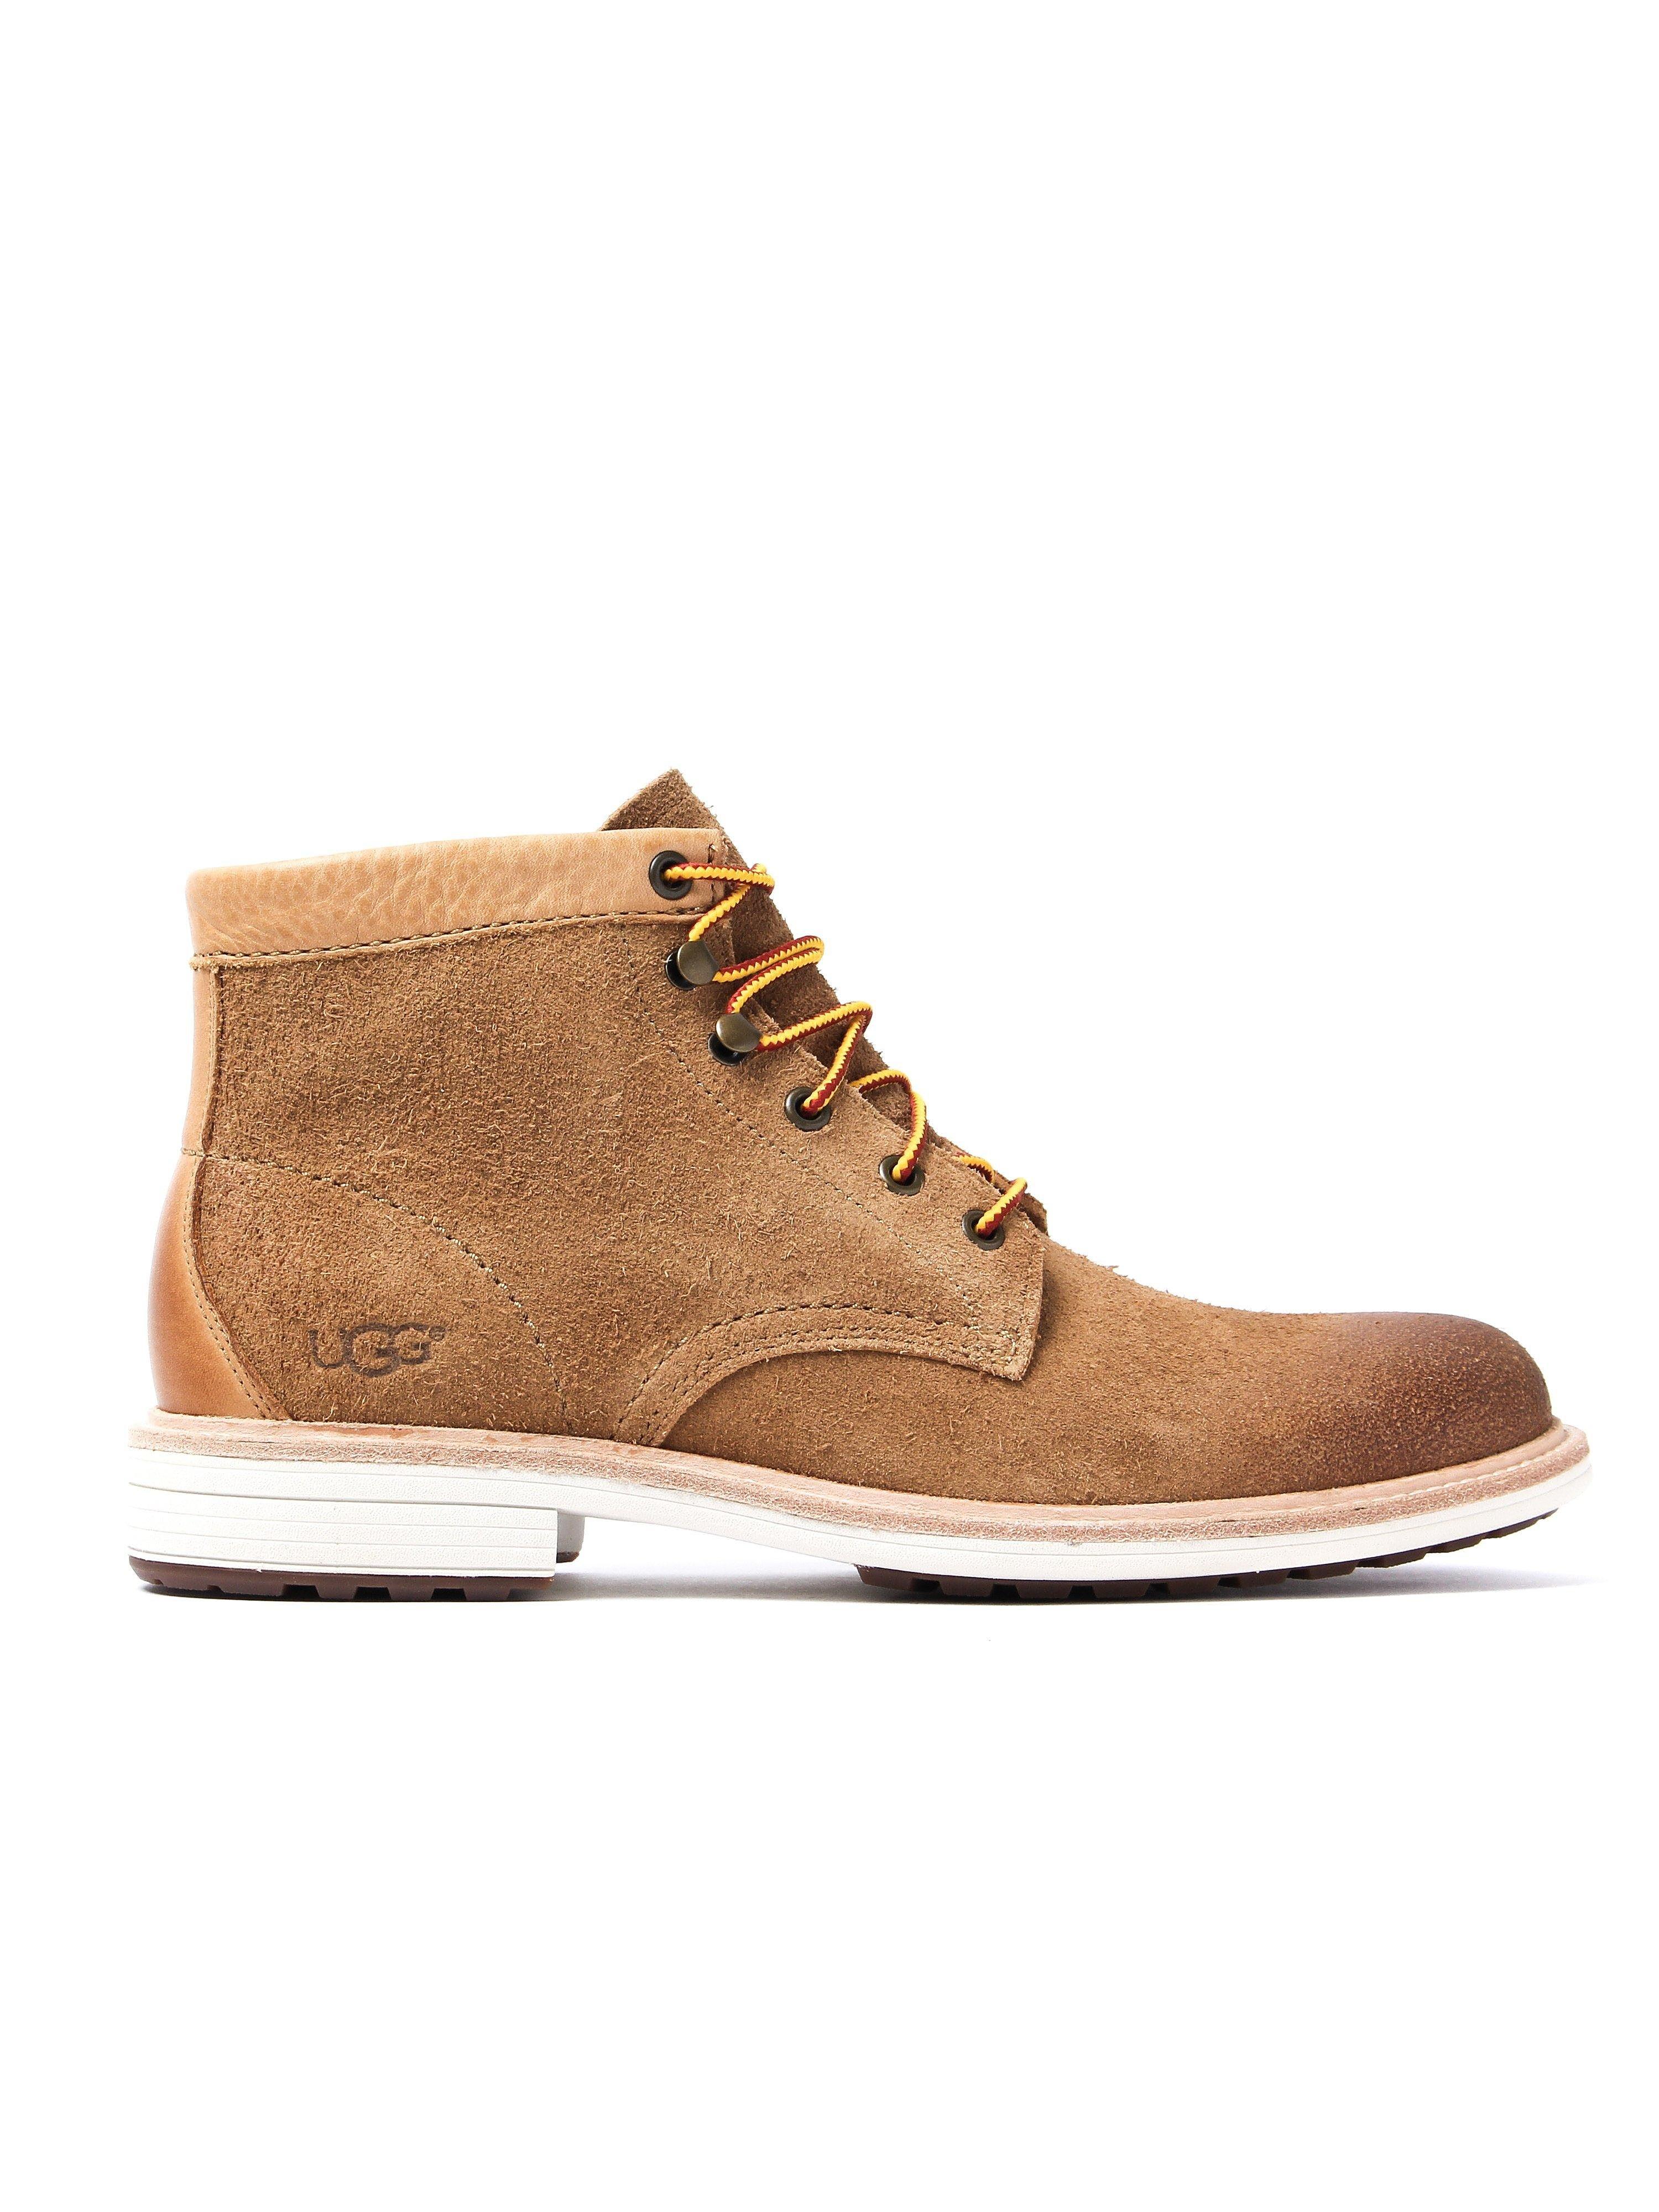 UGG Men's Vestmar Boots - Chestnut Suede